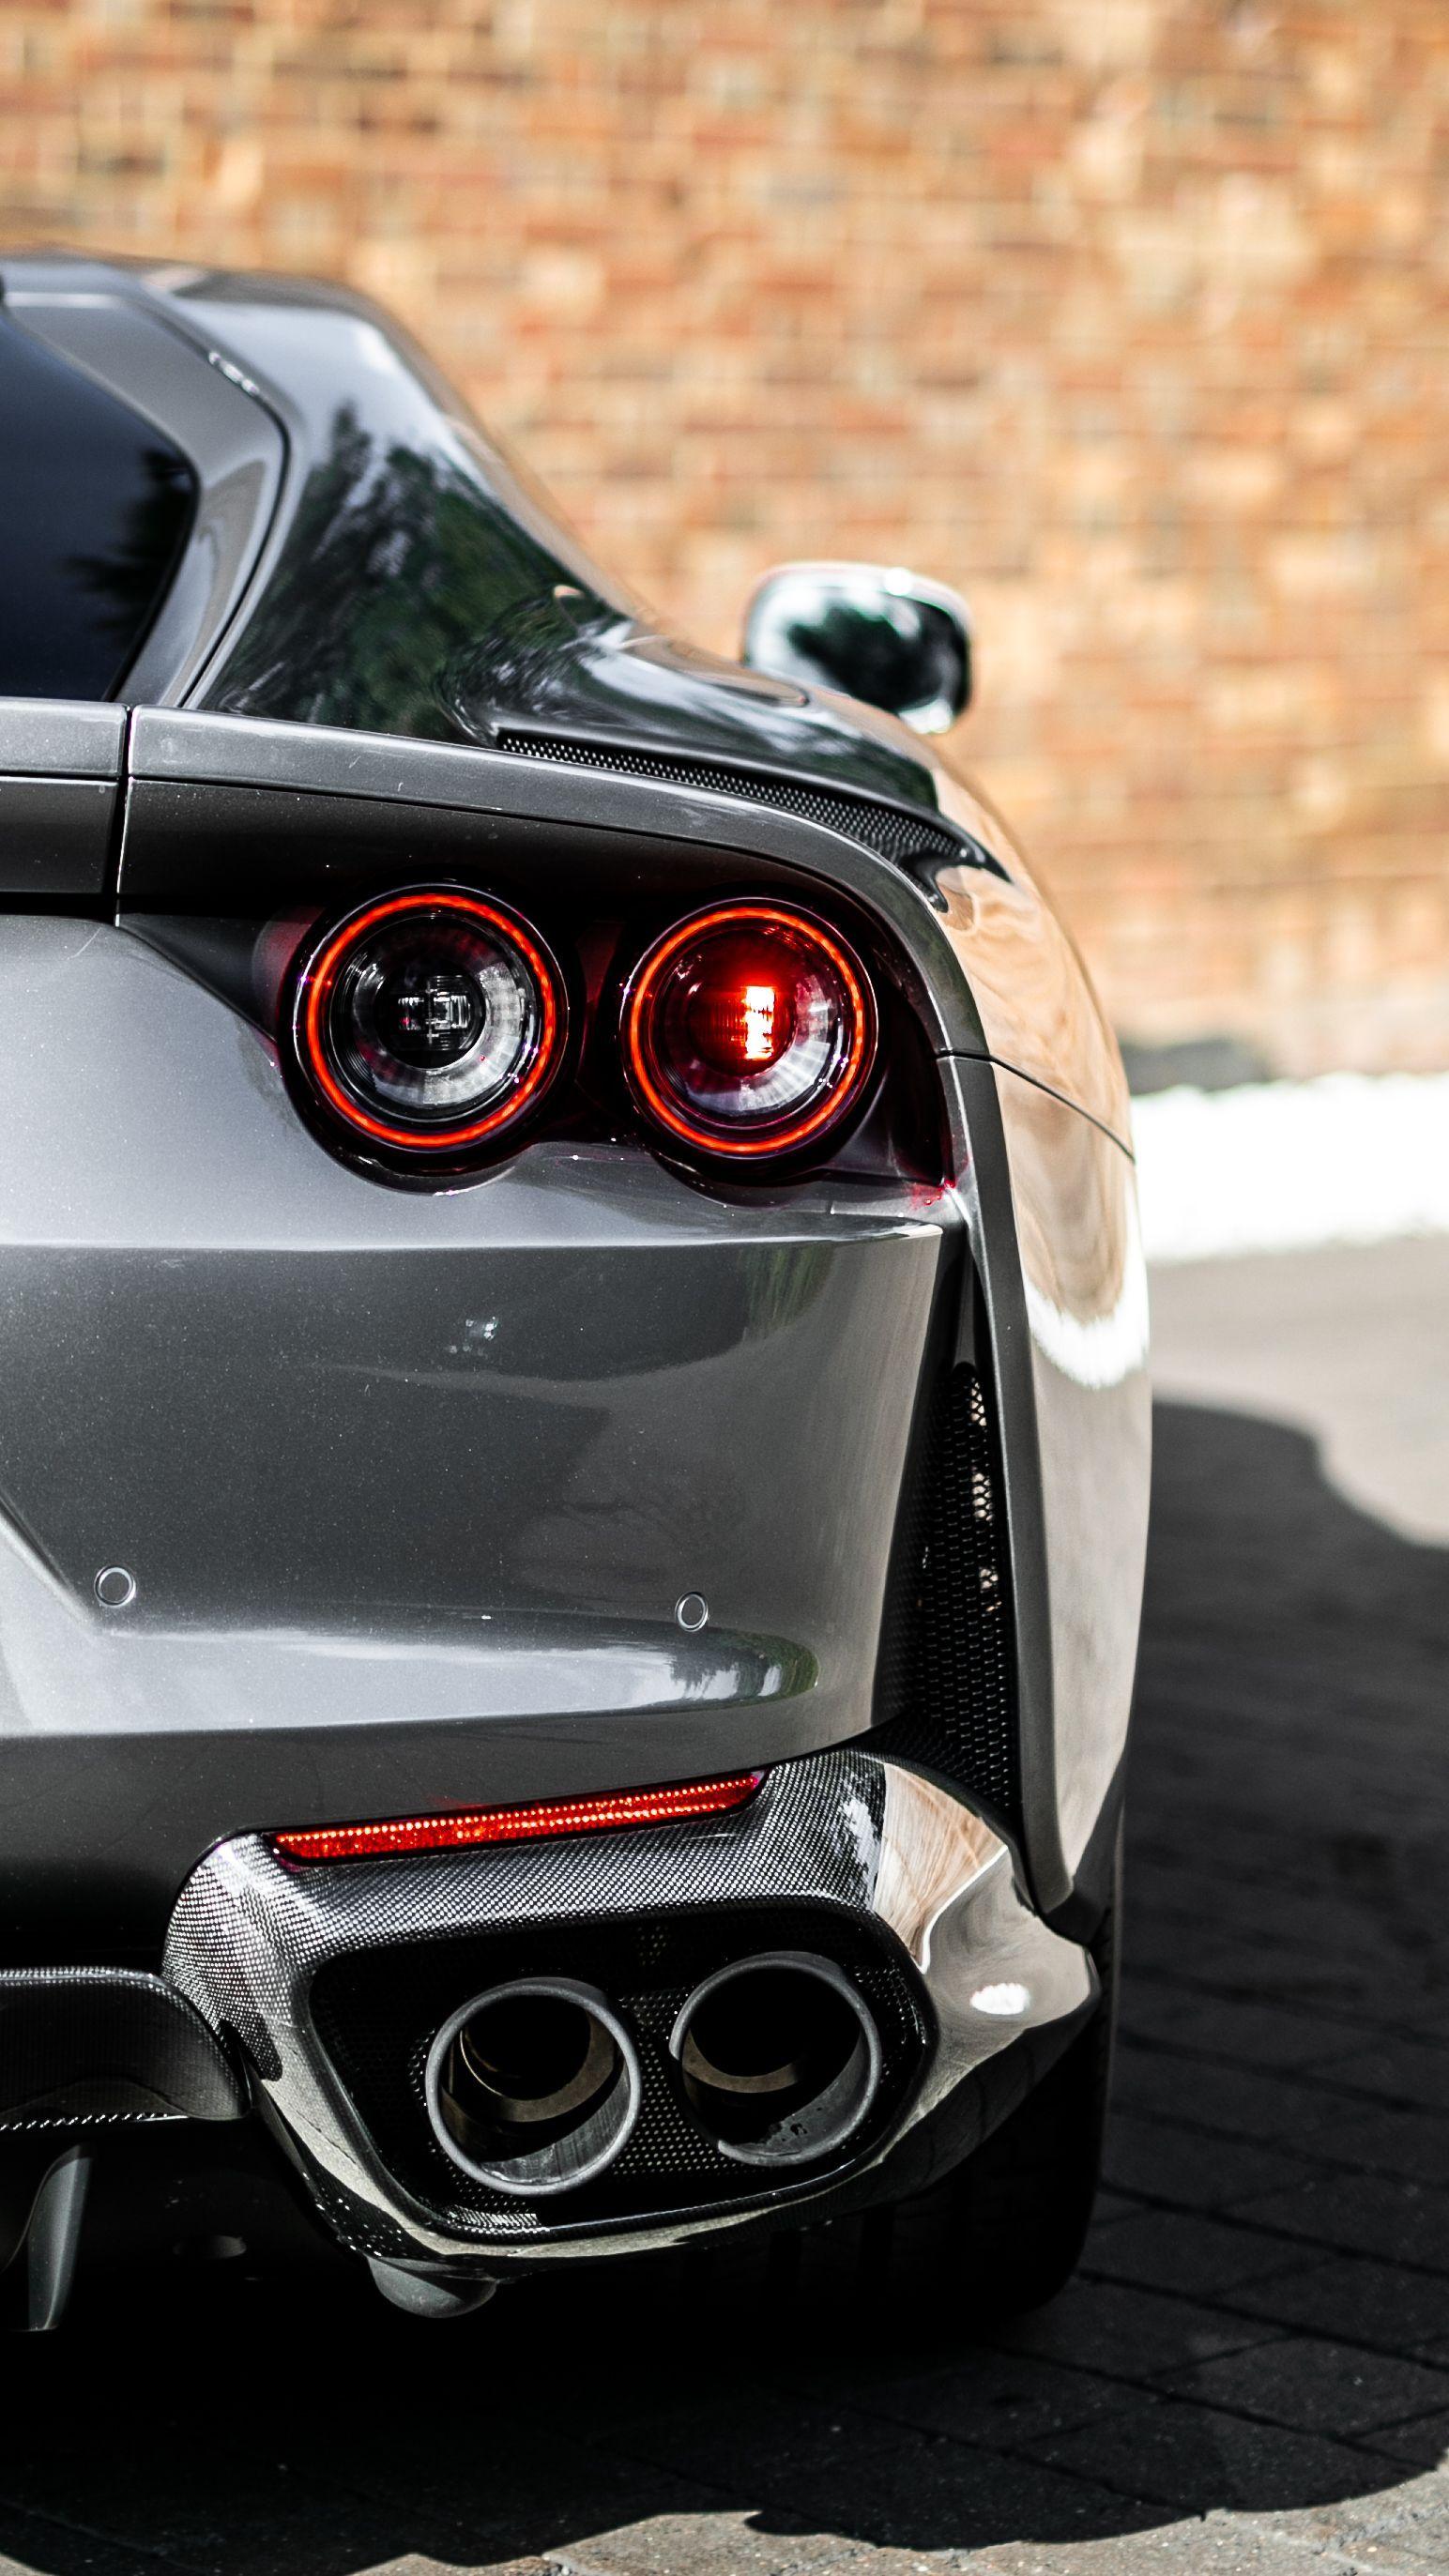 812 Superfast Ferrari 812 Superfast Supercars Cars In 2020 Super Cars Lamborghini Cars Ferrari For Sale